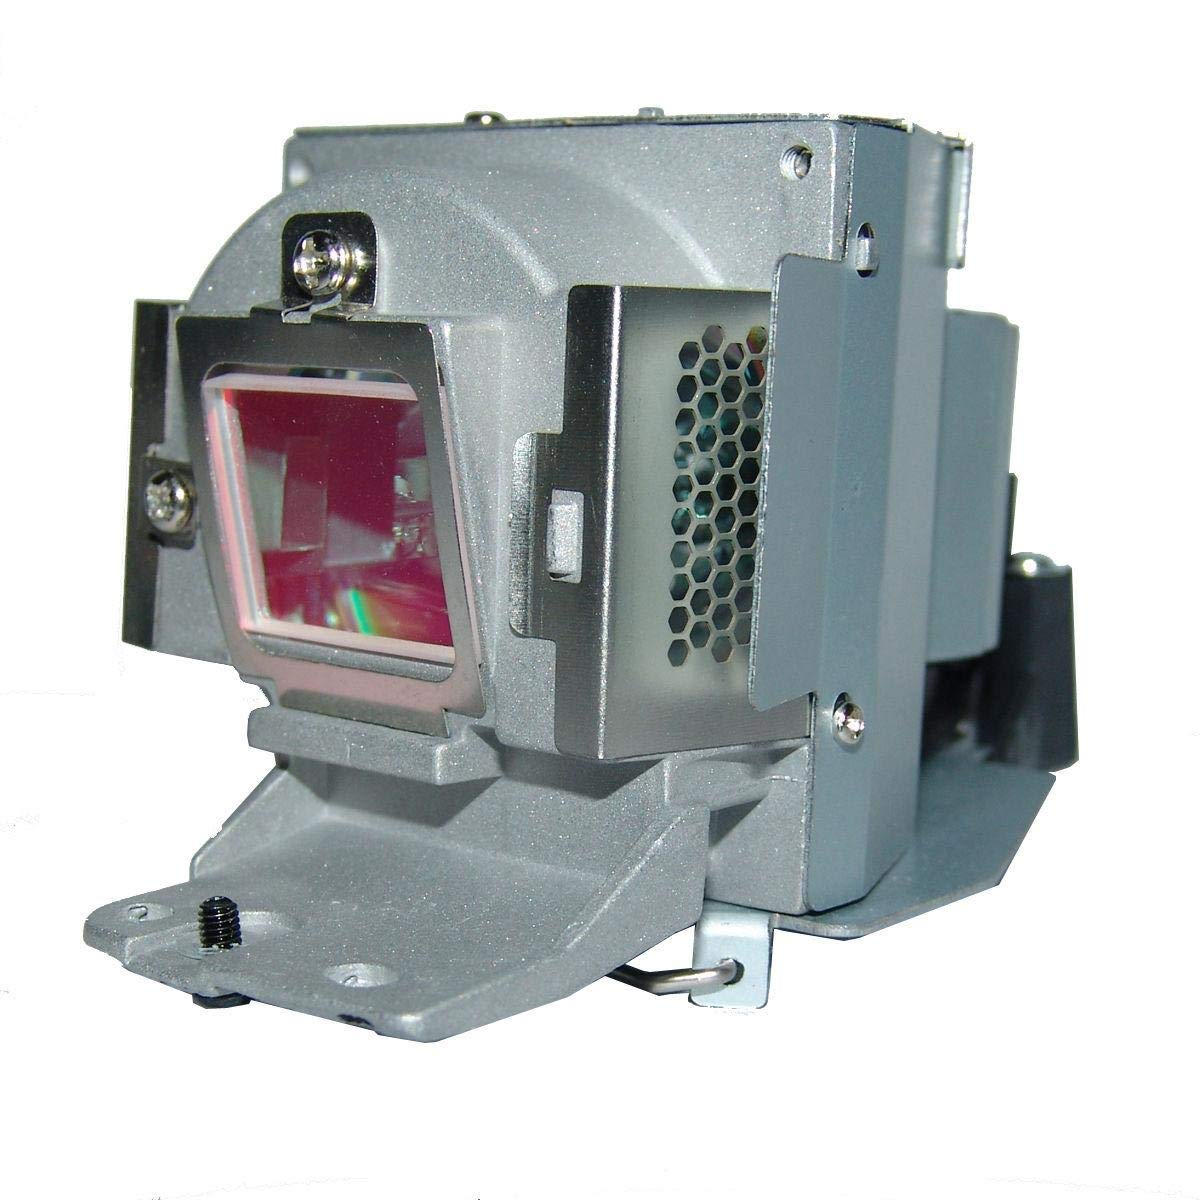 Brighter Lamp 5J.J3T05.001 / LMX-710 / MS614プロジェクターランプ for ベンキューBenq MX660P MS614 MX710 交換用 【ハウジング付き/高輝度/長寿命】   B075N1KWPF